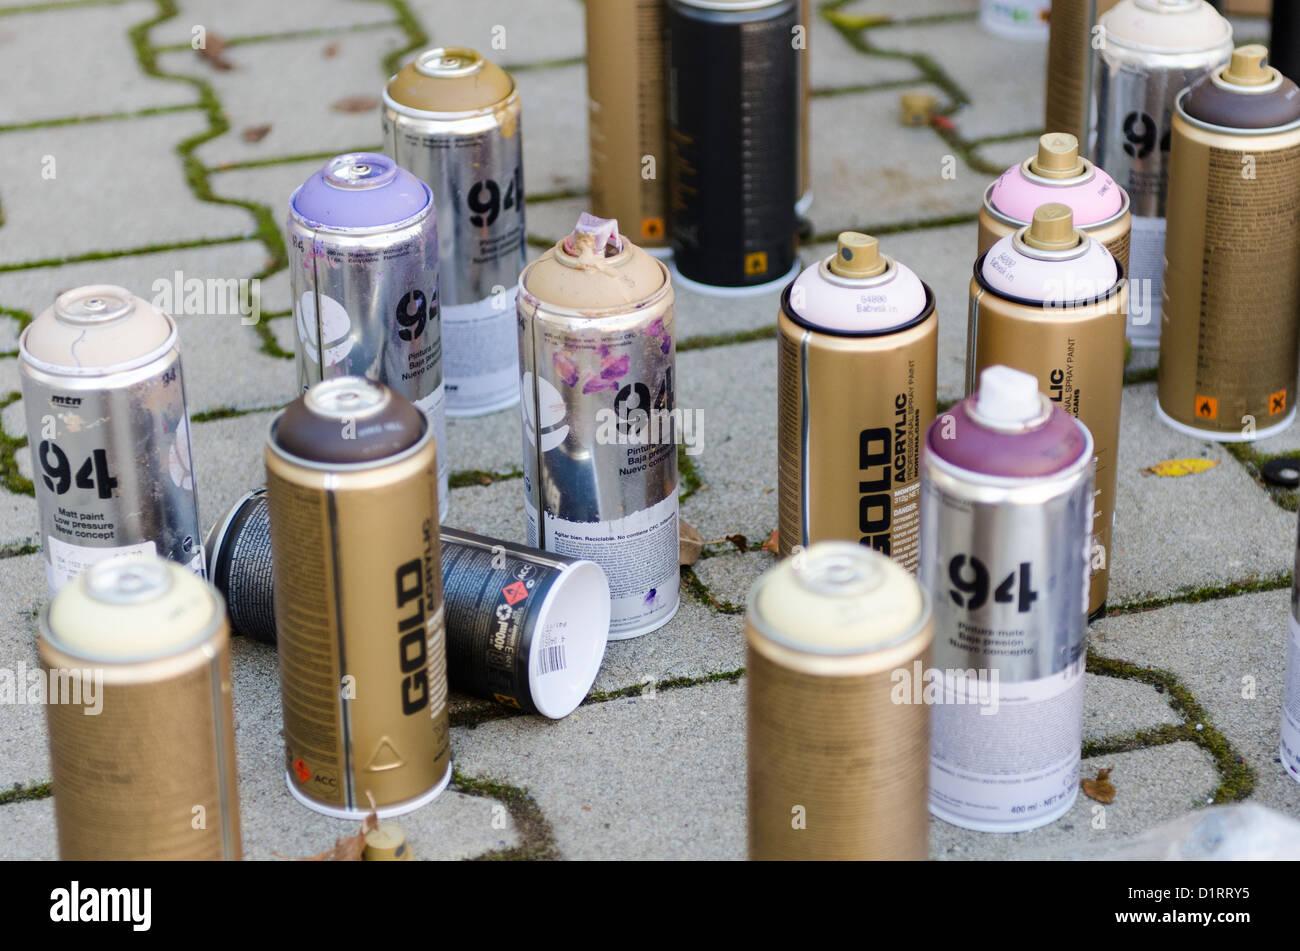 Bombe 94 Montana tout spray kunst stock photos & spray kunst stock images - alamy